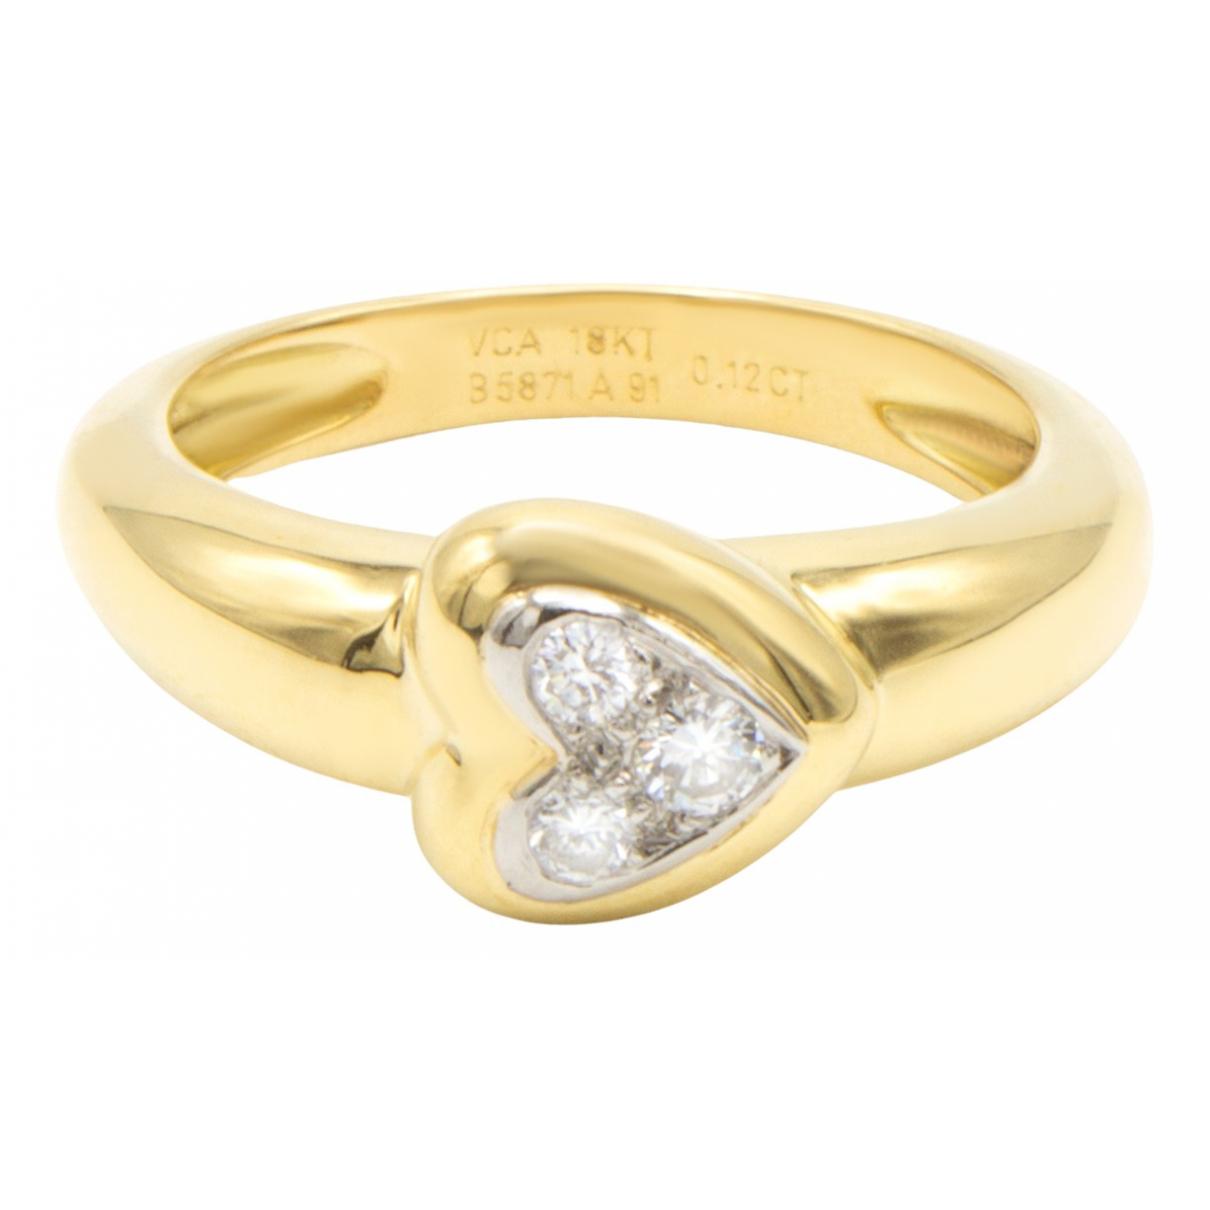 Van Cleef & Arpels - Bague   pour femme en or jaune - dore